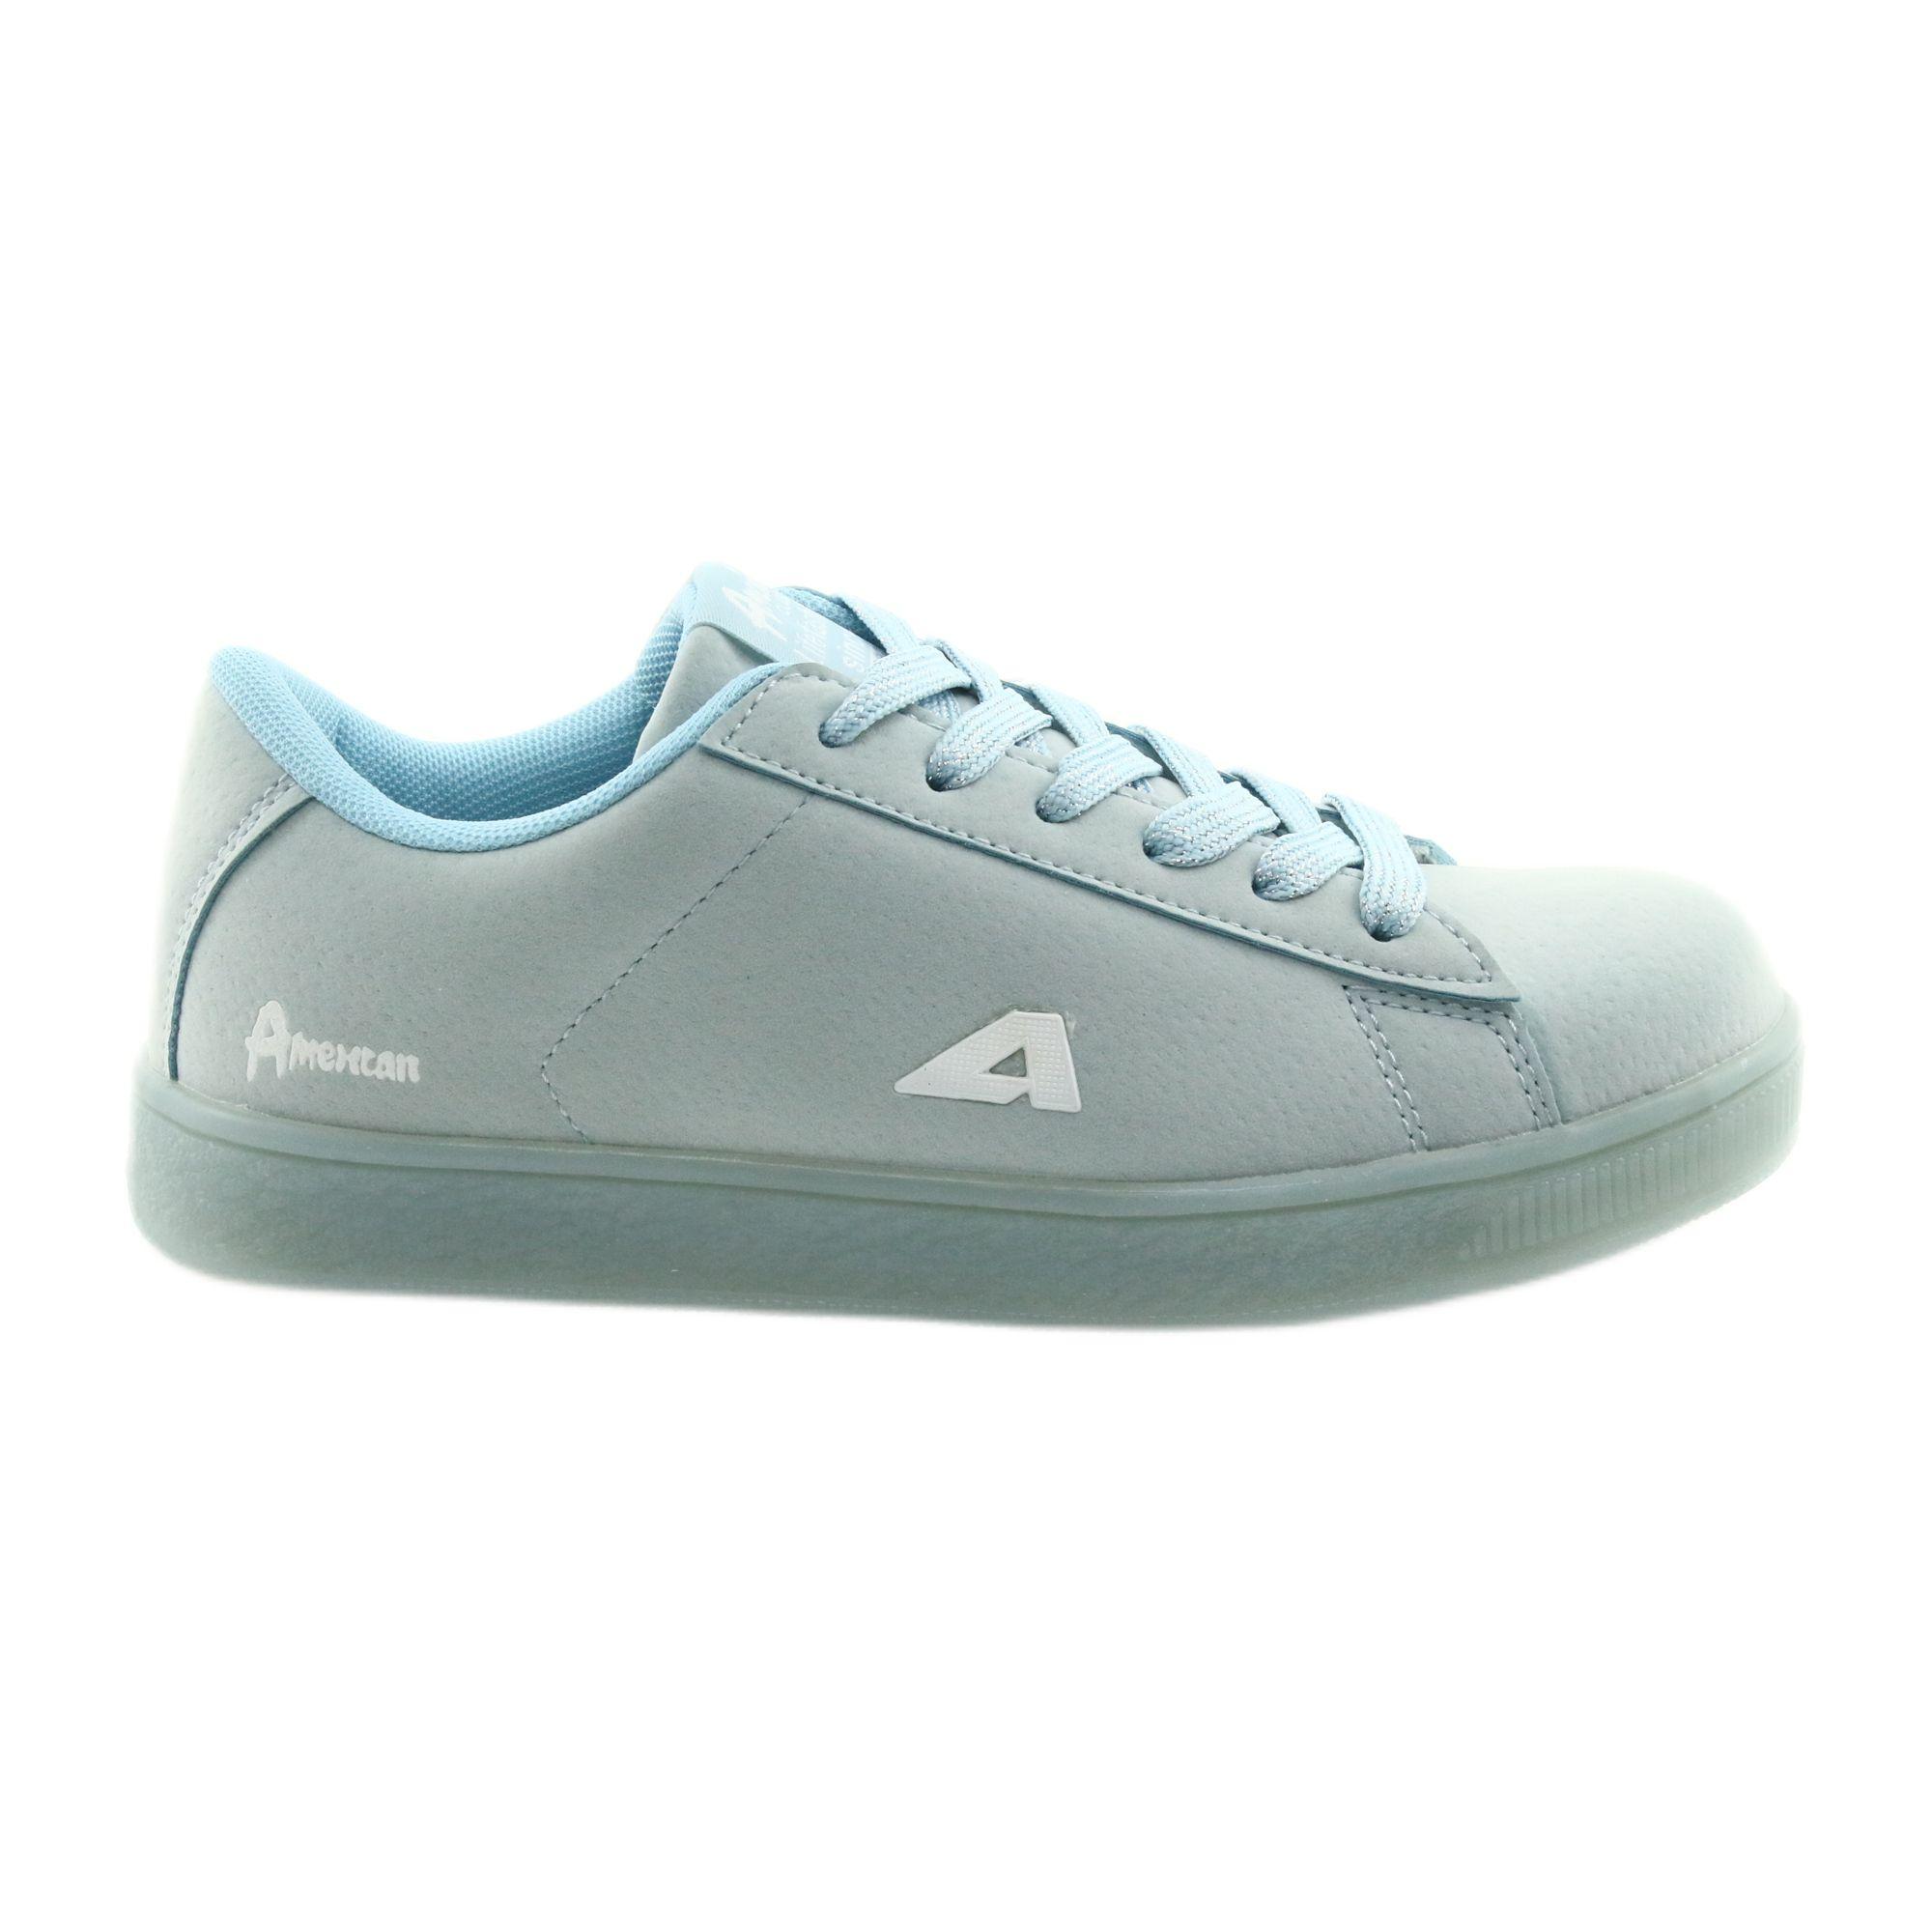 Buty Sportowe American Club Bs07 Wkladka Skorzana Niebieskie Sports Shoes Shoes Kid Shoes